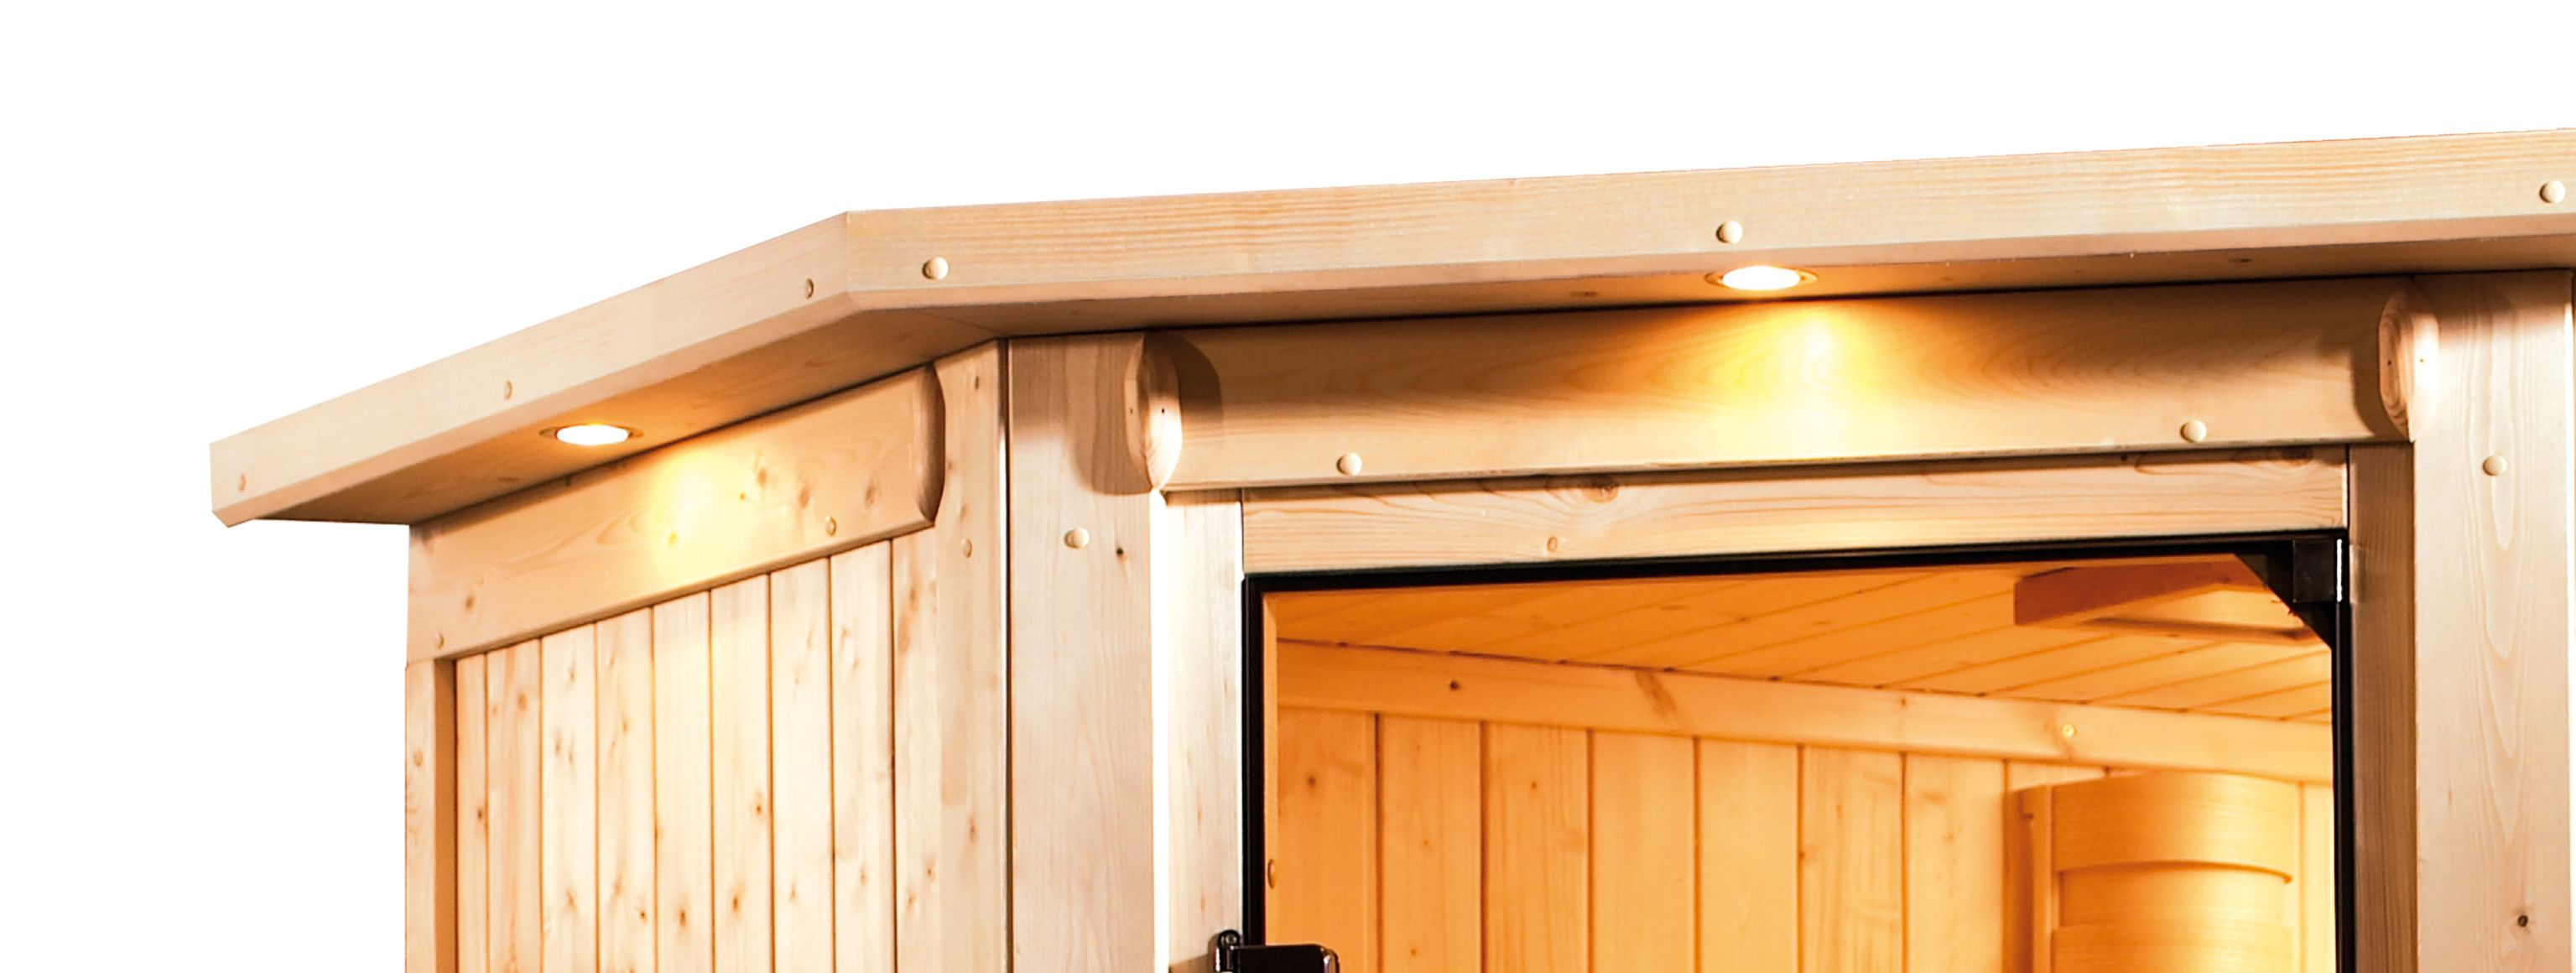 Woodfeeling Sauna Tilda 38mm Dachkranz Saunaofen 9kW intern Bild 10